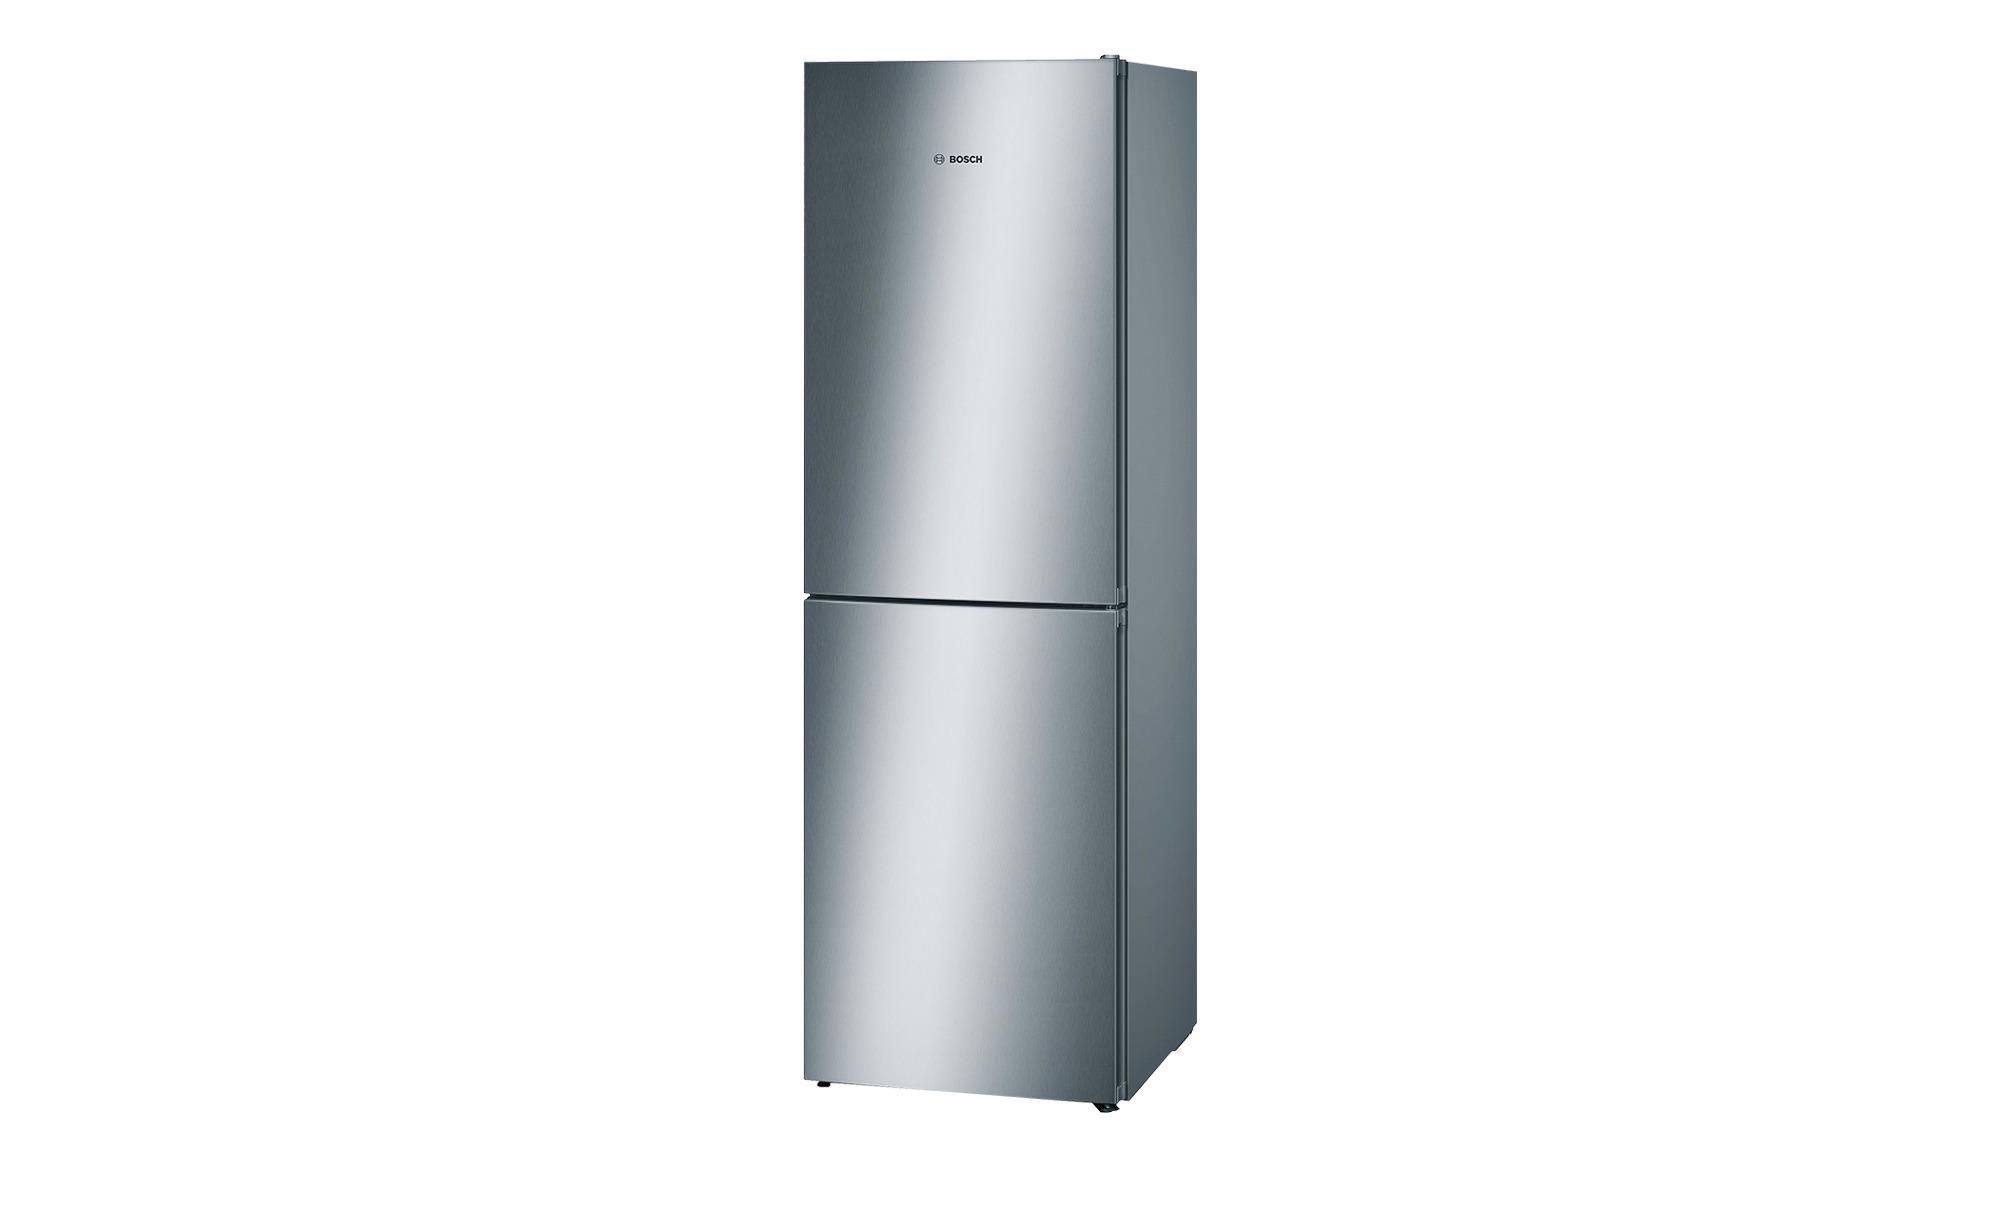 Kühlschrank Alarm : Bosch kühlschrank alarm bosch kühlschrank scharnier